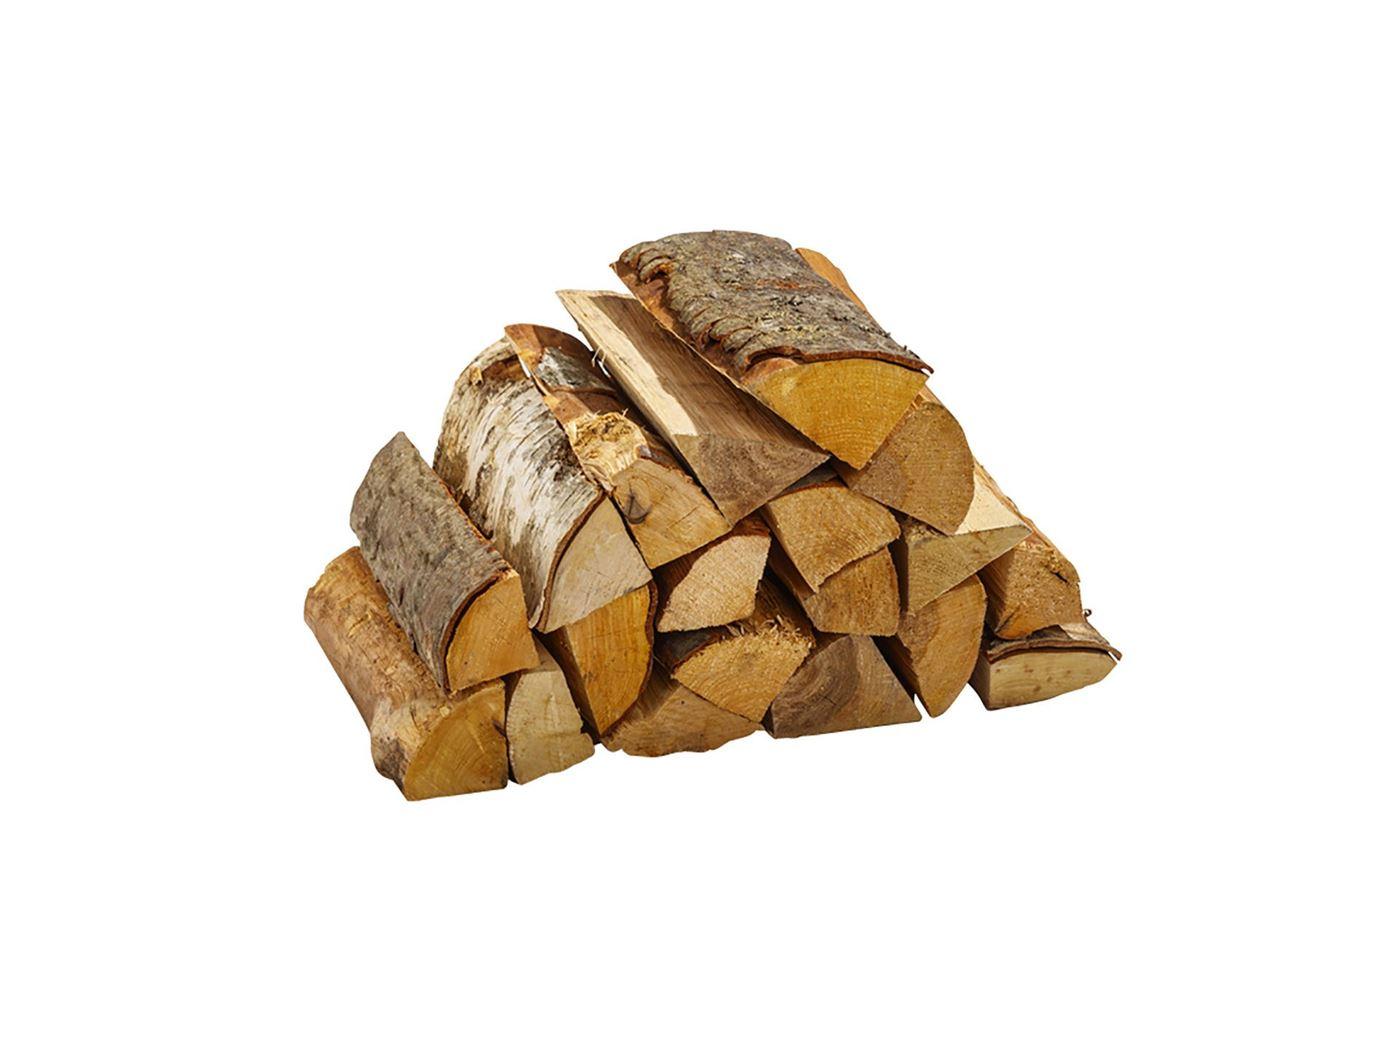 fireland gekliefd brandhout